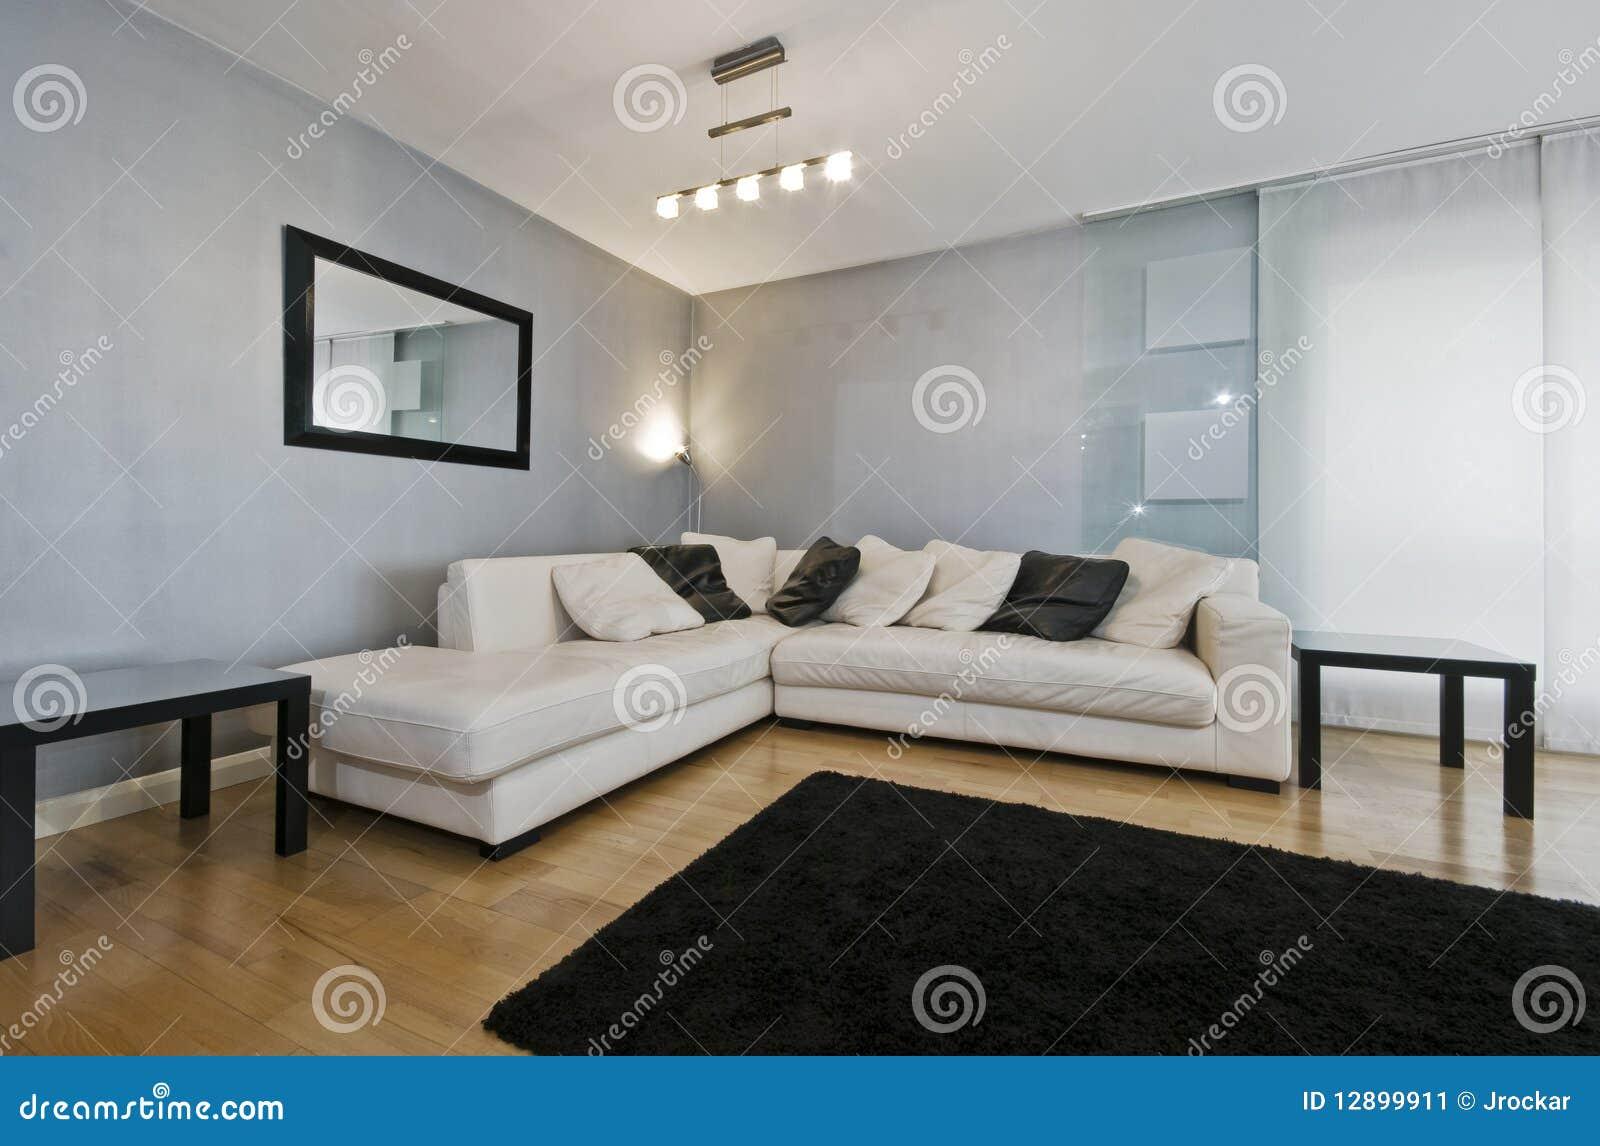 massive corner sofa stock image image 12899911. Black Bedroom Furniture Sets. Home Design Ideas